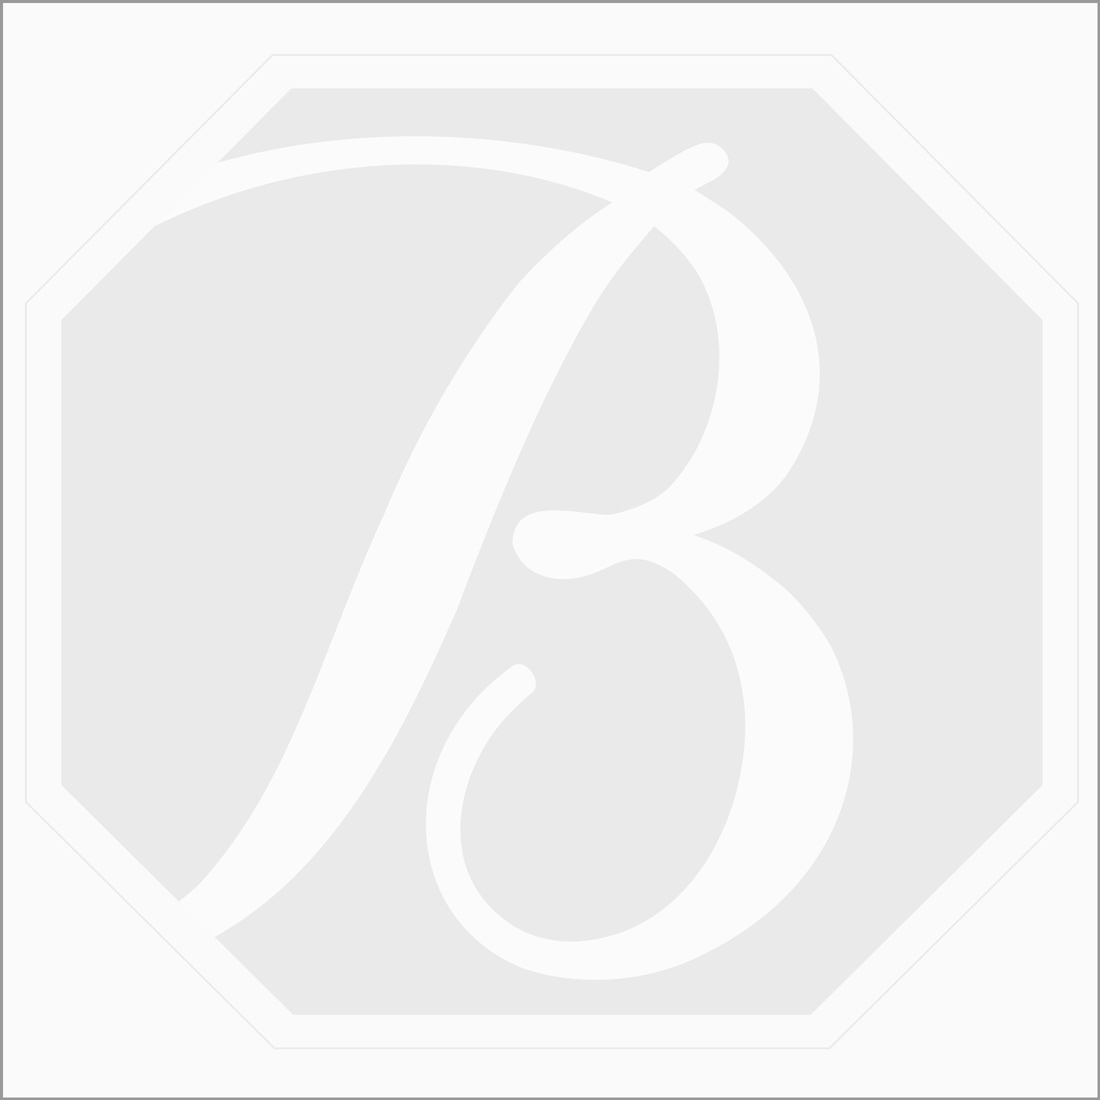 0.92 ct. Oval (H-VS1) White Rose Cut Diamond Photograph